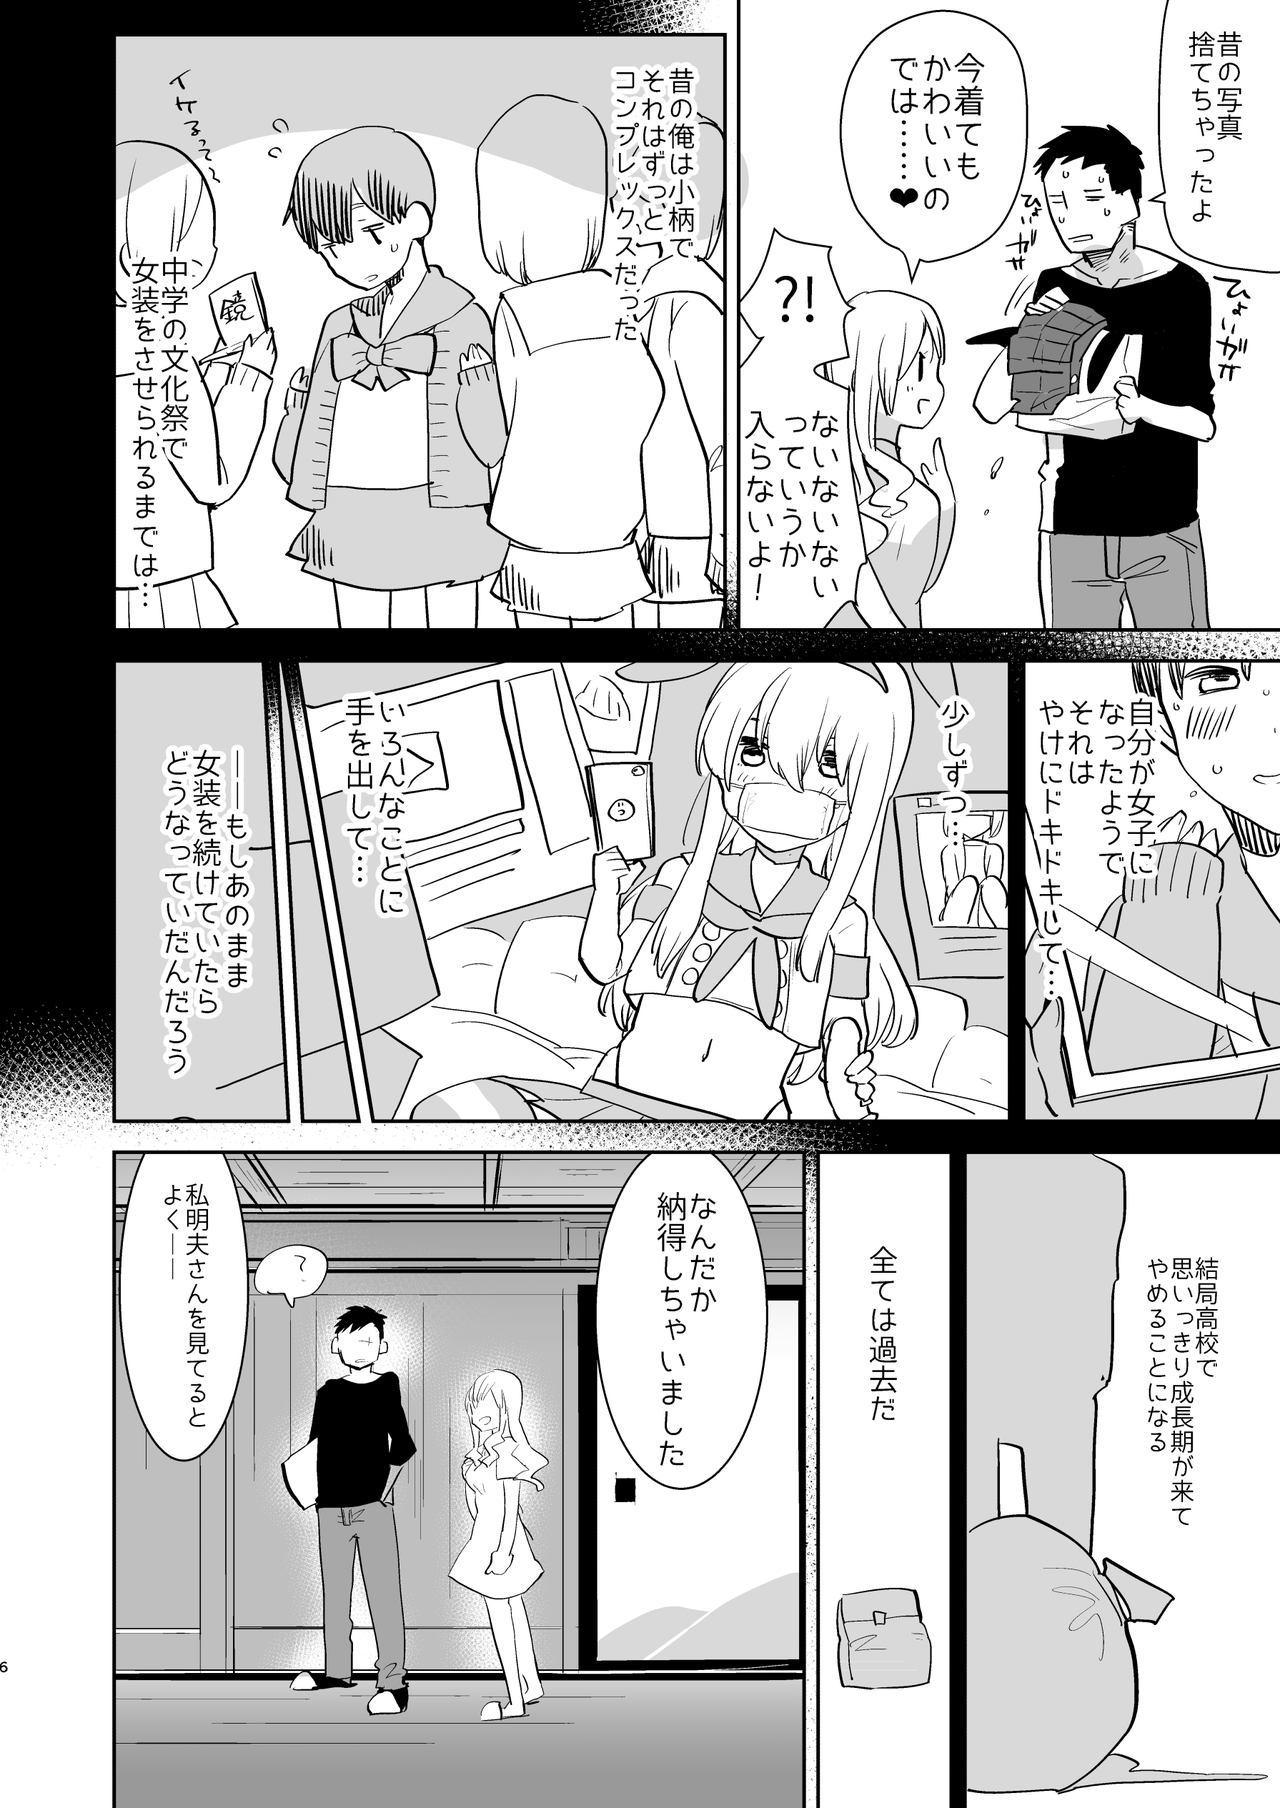 [Aimaitei (Aimaitei Umami)] Otto wa Shimakaze-kun 30-sai [Digital] 5